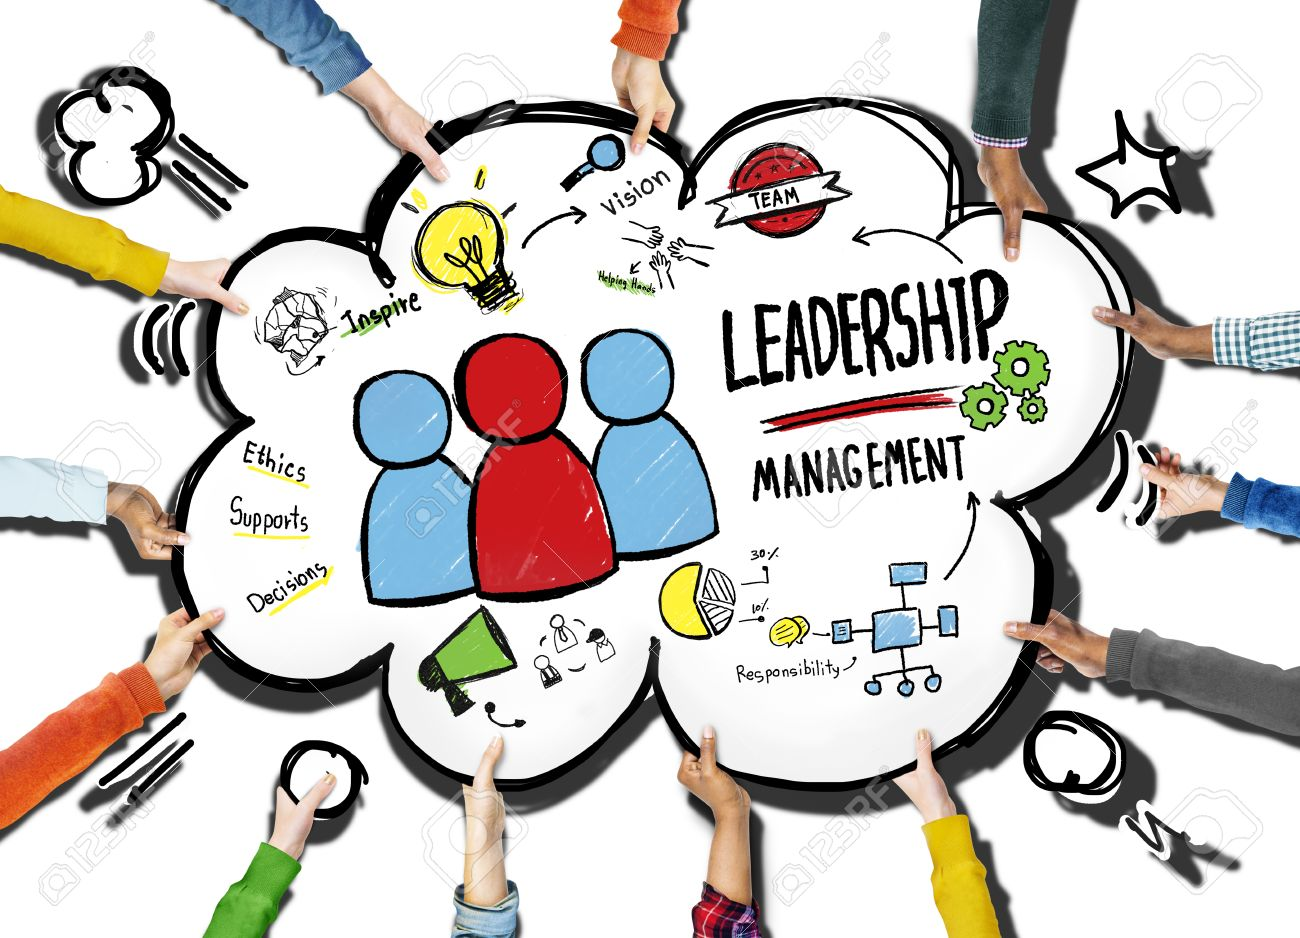 diversity hands leadership management team support volunteer stock